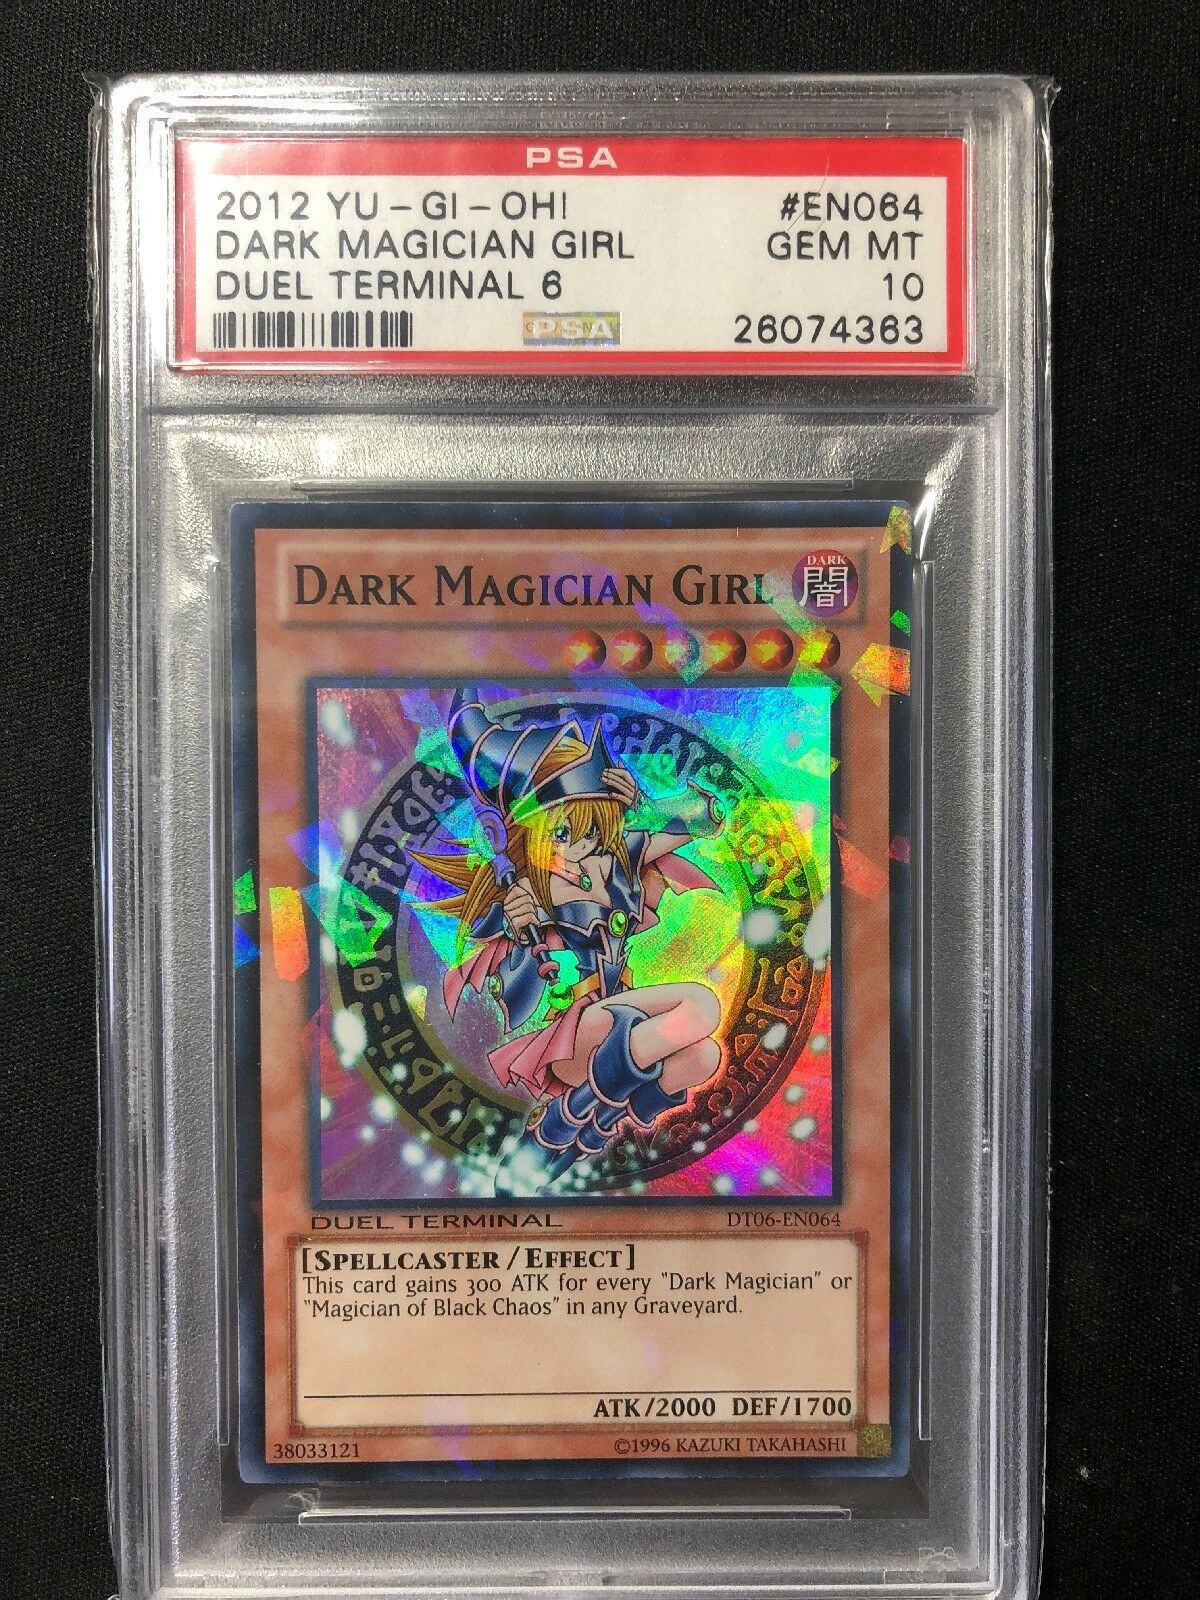 Yugioh Dark Magician Girl Duel Terminal DT06 Super Rare PSA Graded 10 Gem Mint